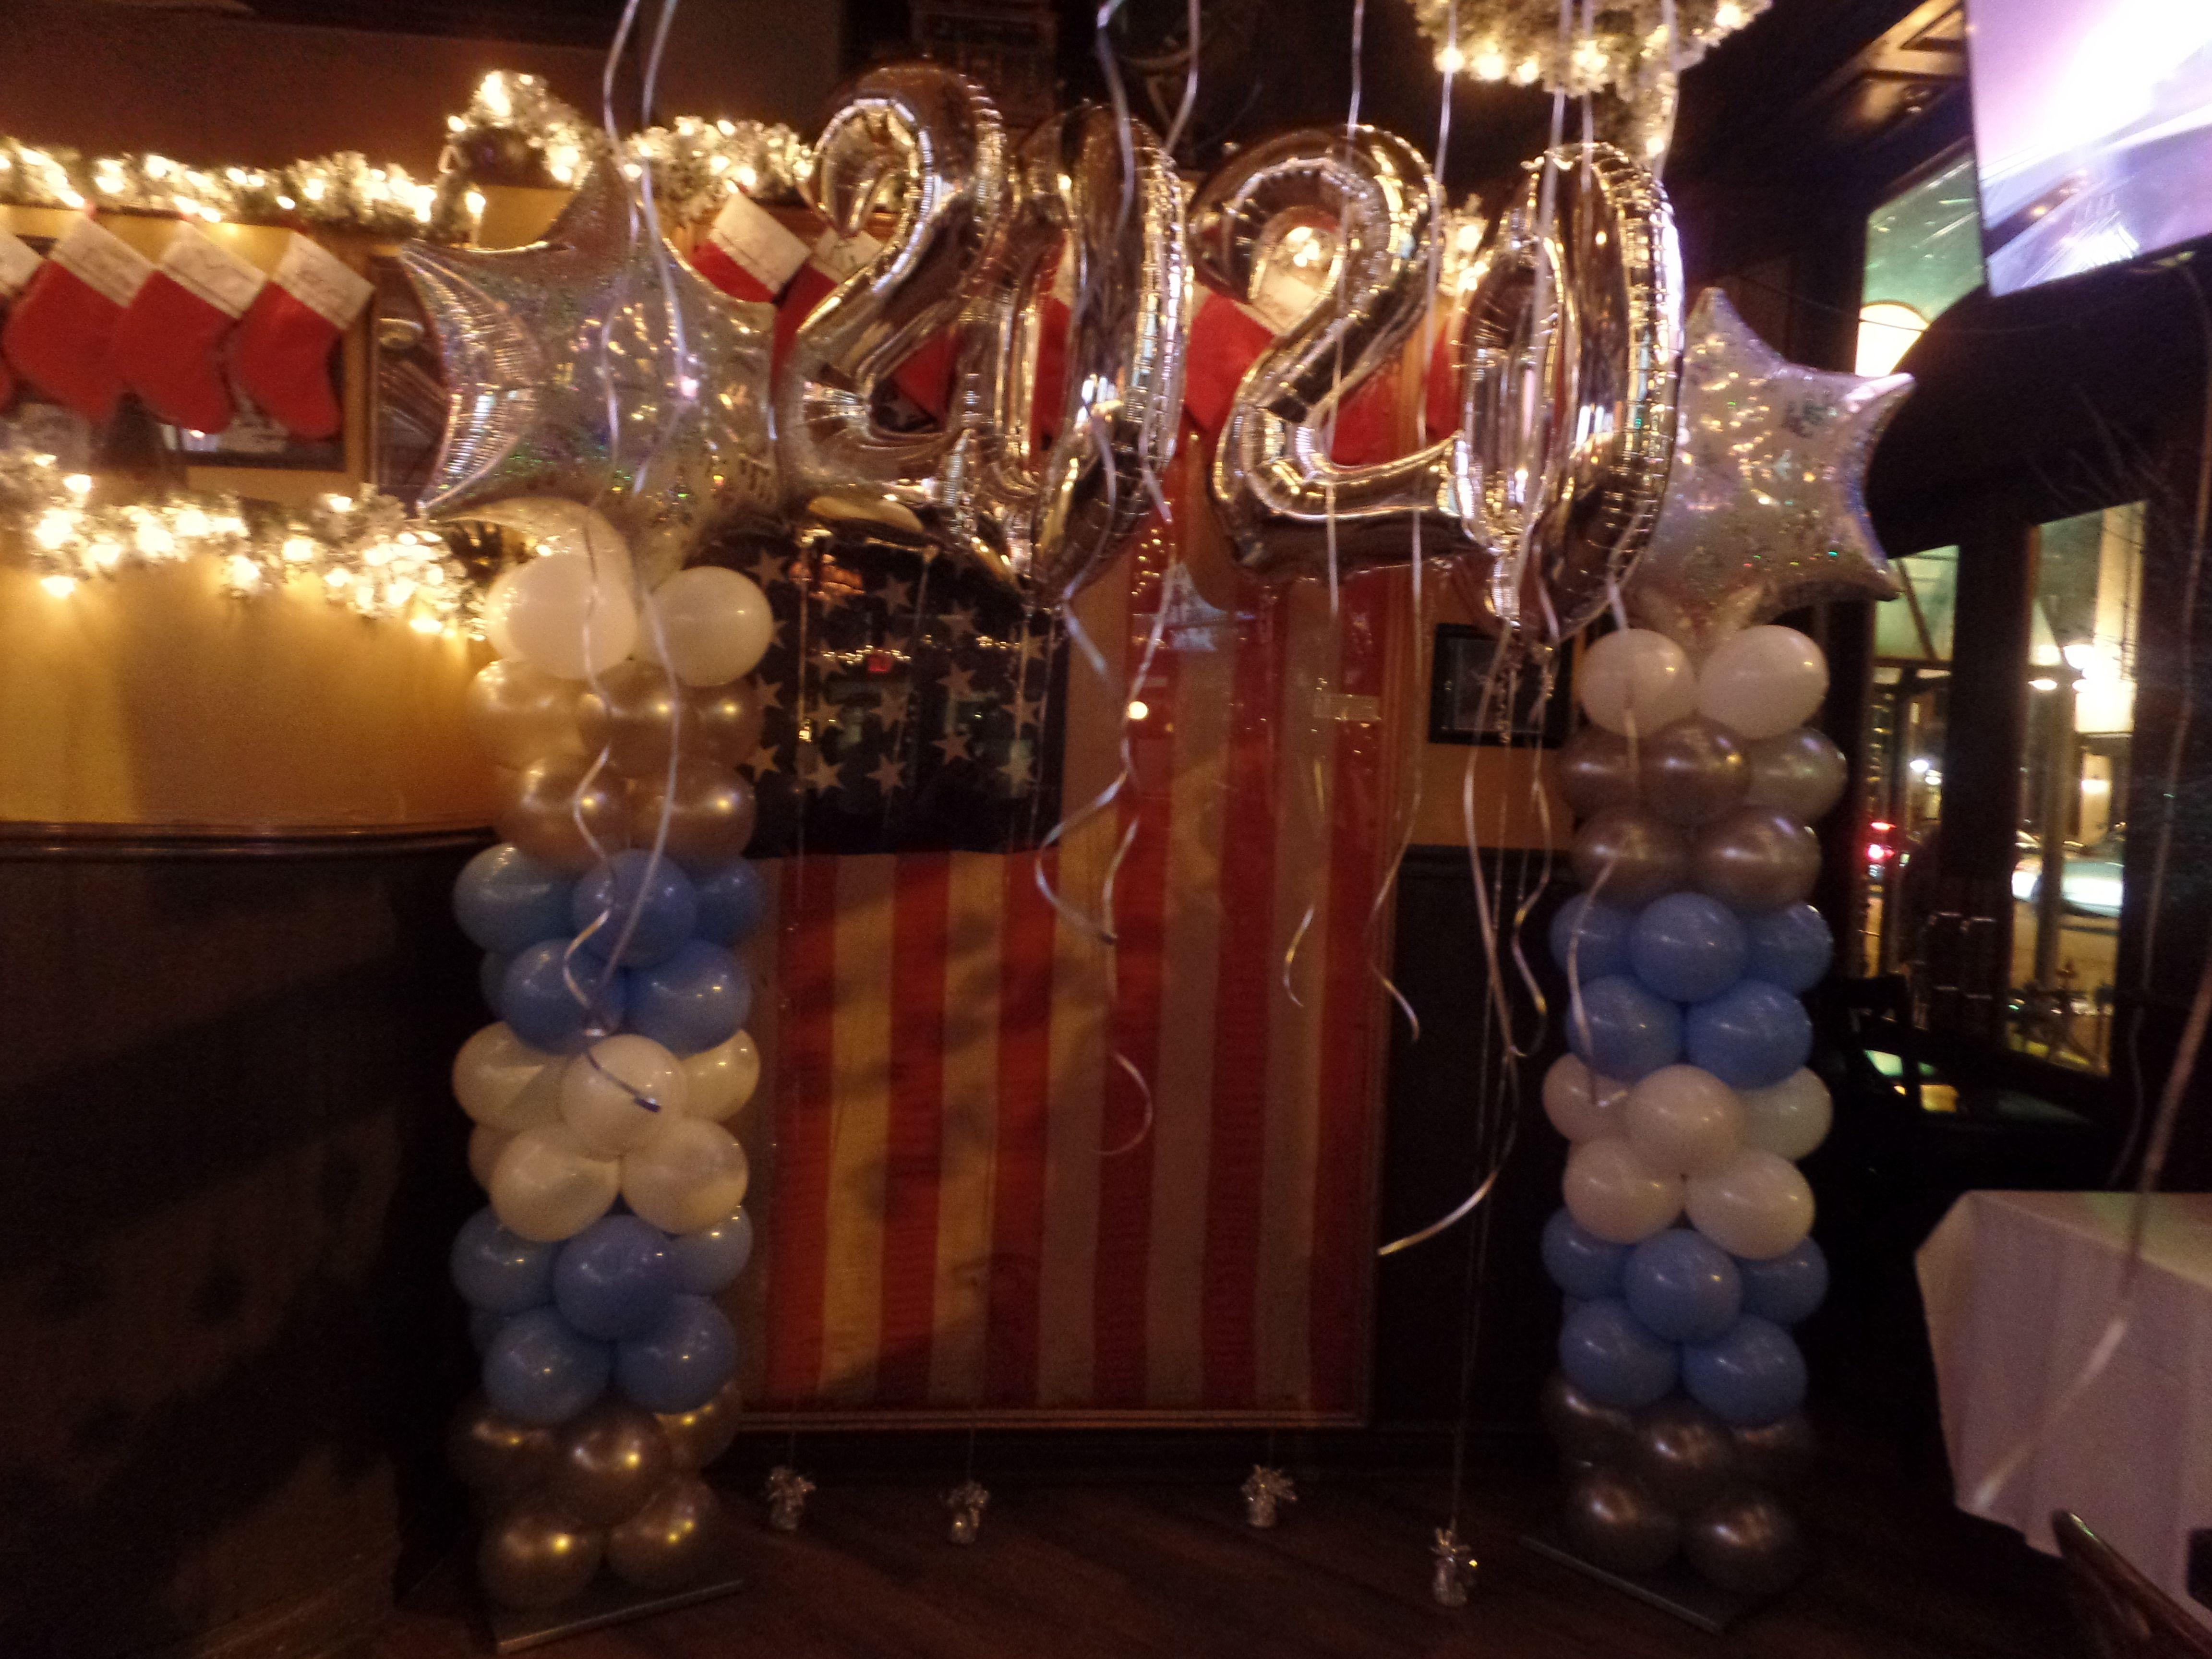 186) New Year's Eve Winter Wonderland Theme Balloon ...